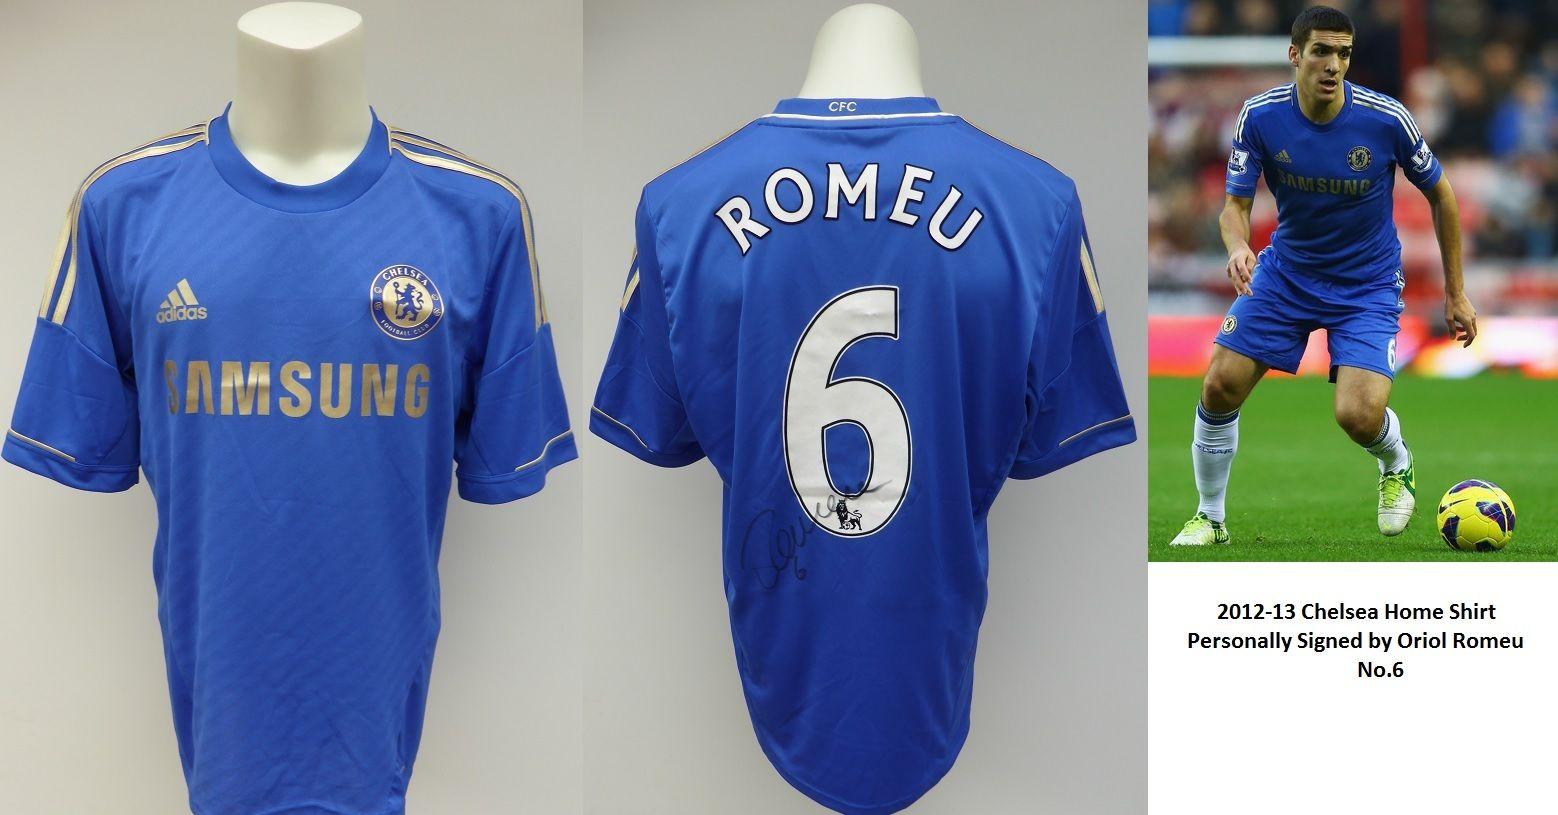 free shipping aaa8e f0e51 2012-13 Chelsea Home Shirt Signed by Oriol Romeu No.6 - Rare Shirt (10178)